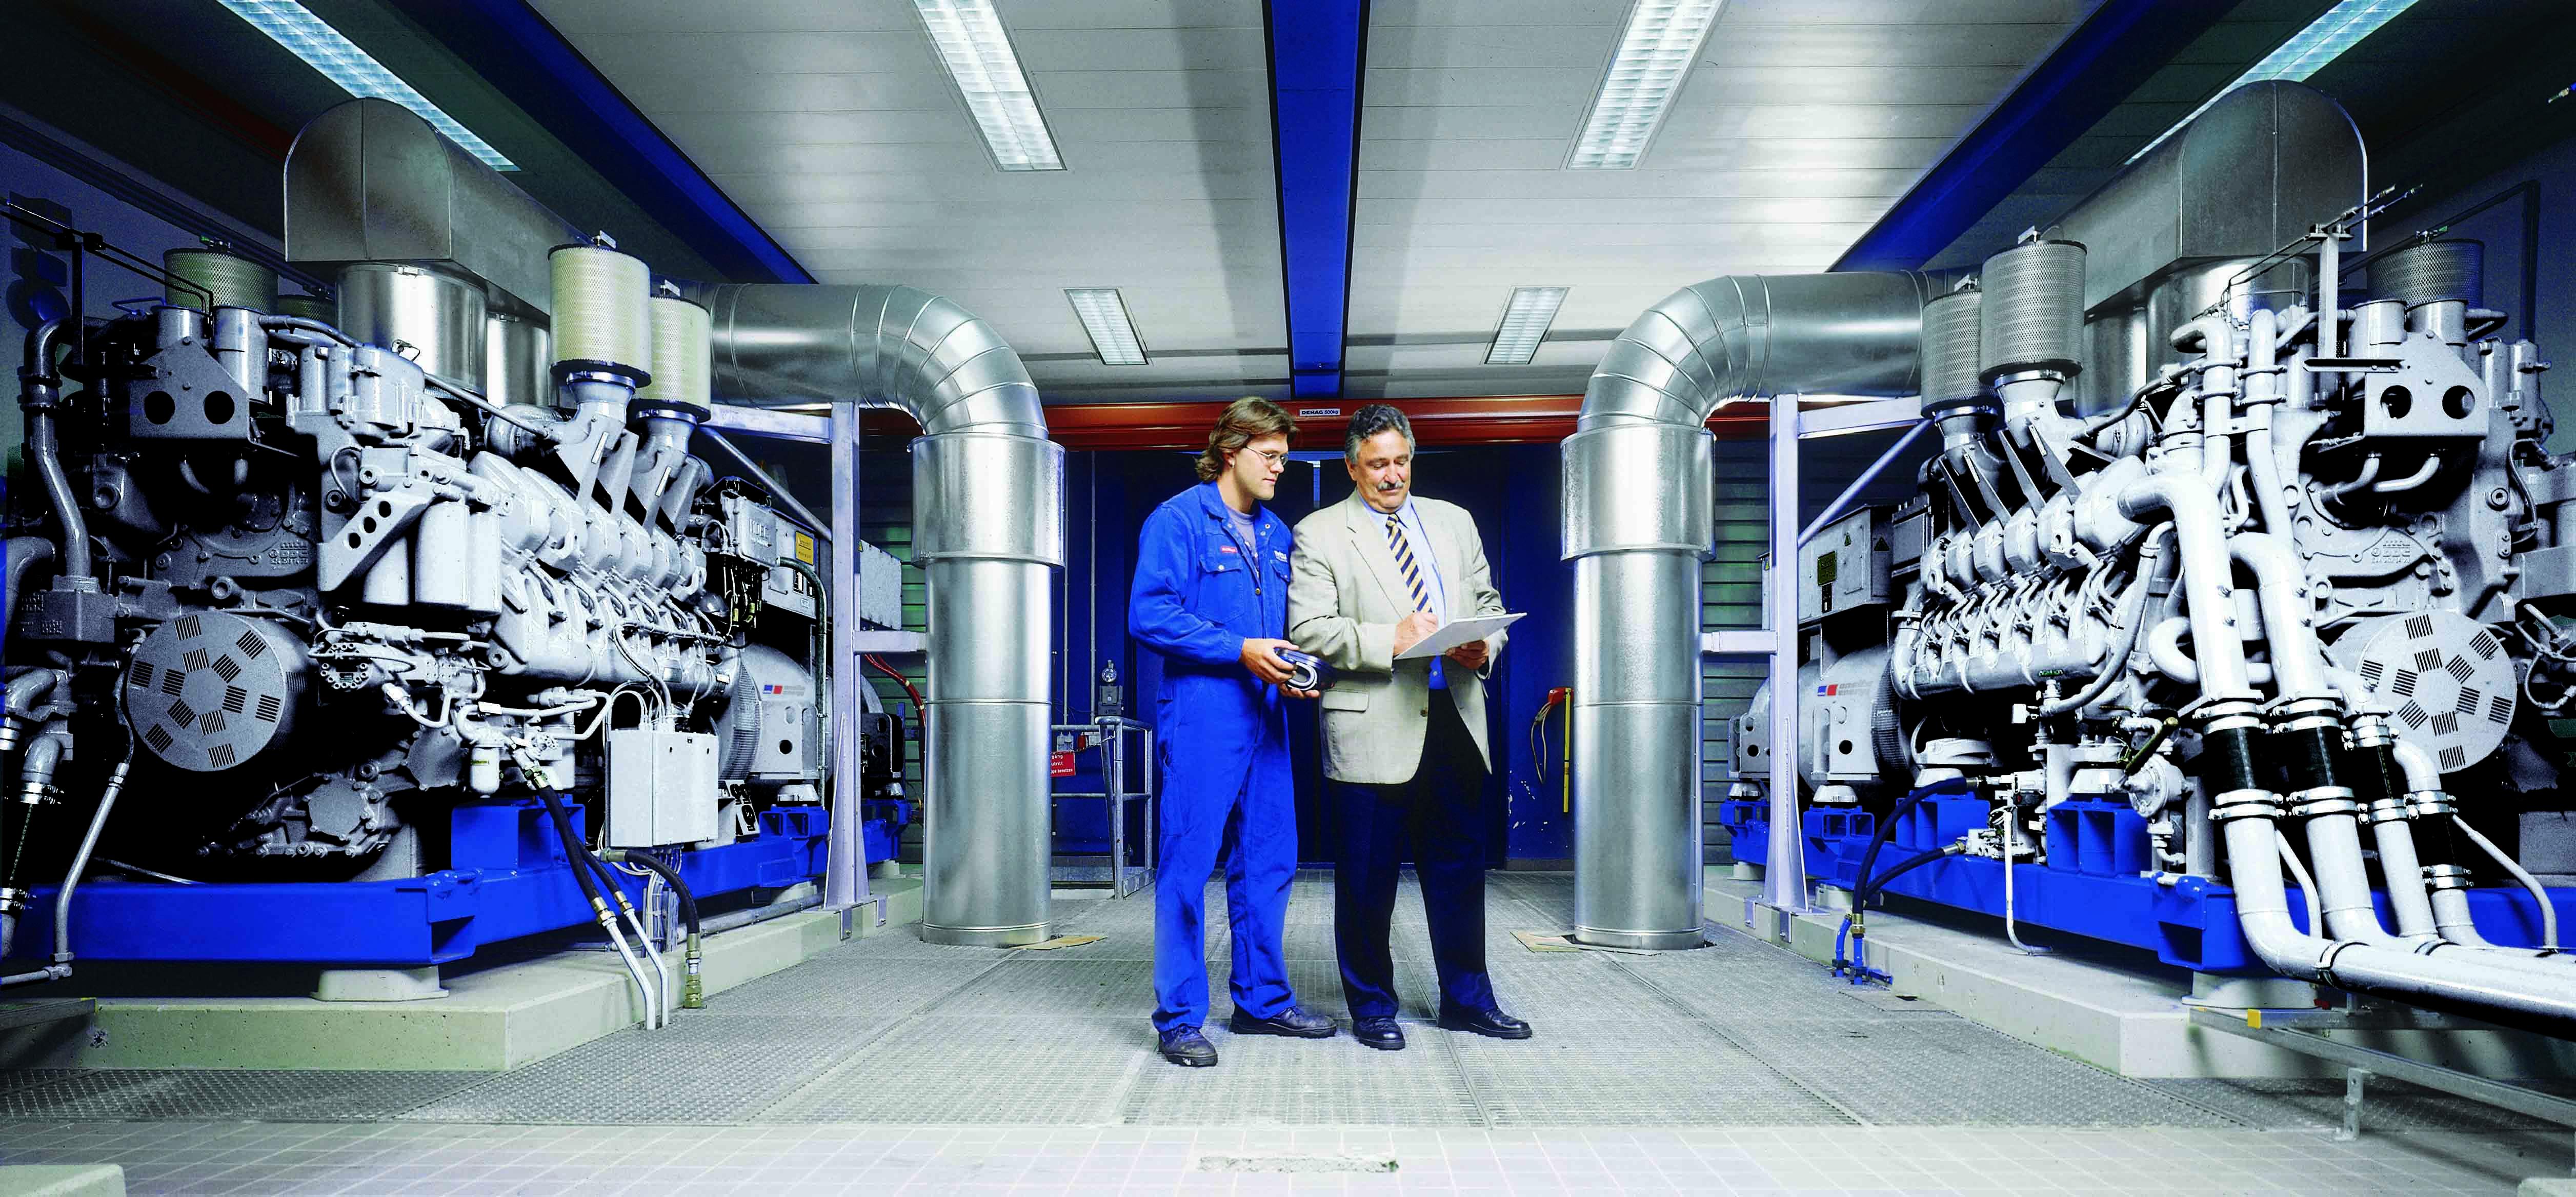 封面1__12V 4000 MTU Onsite Energy-1